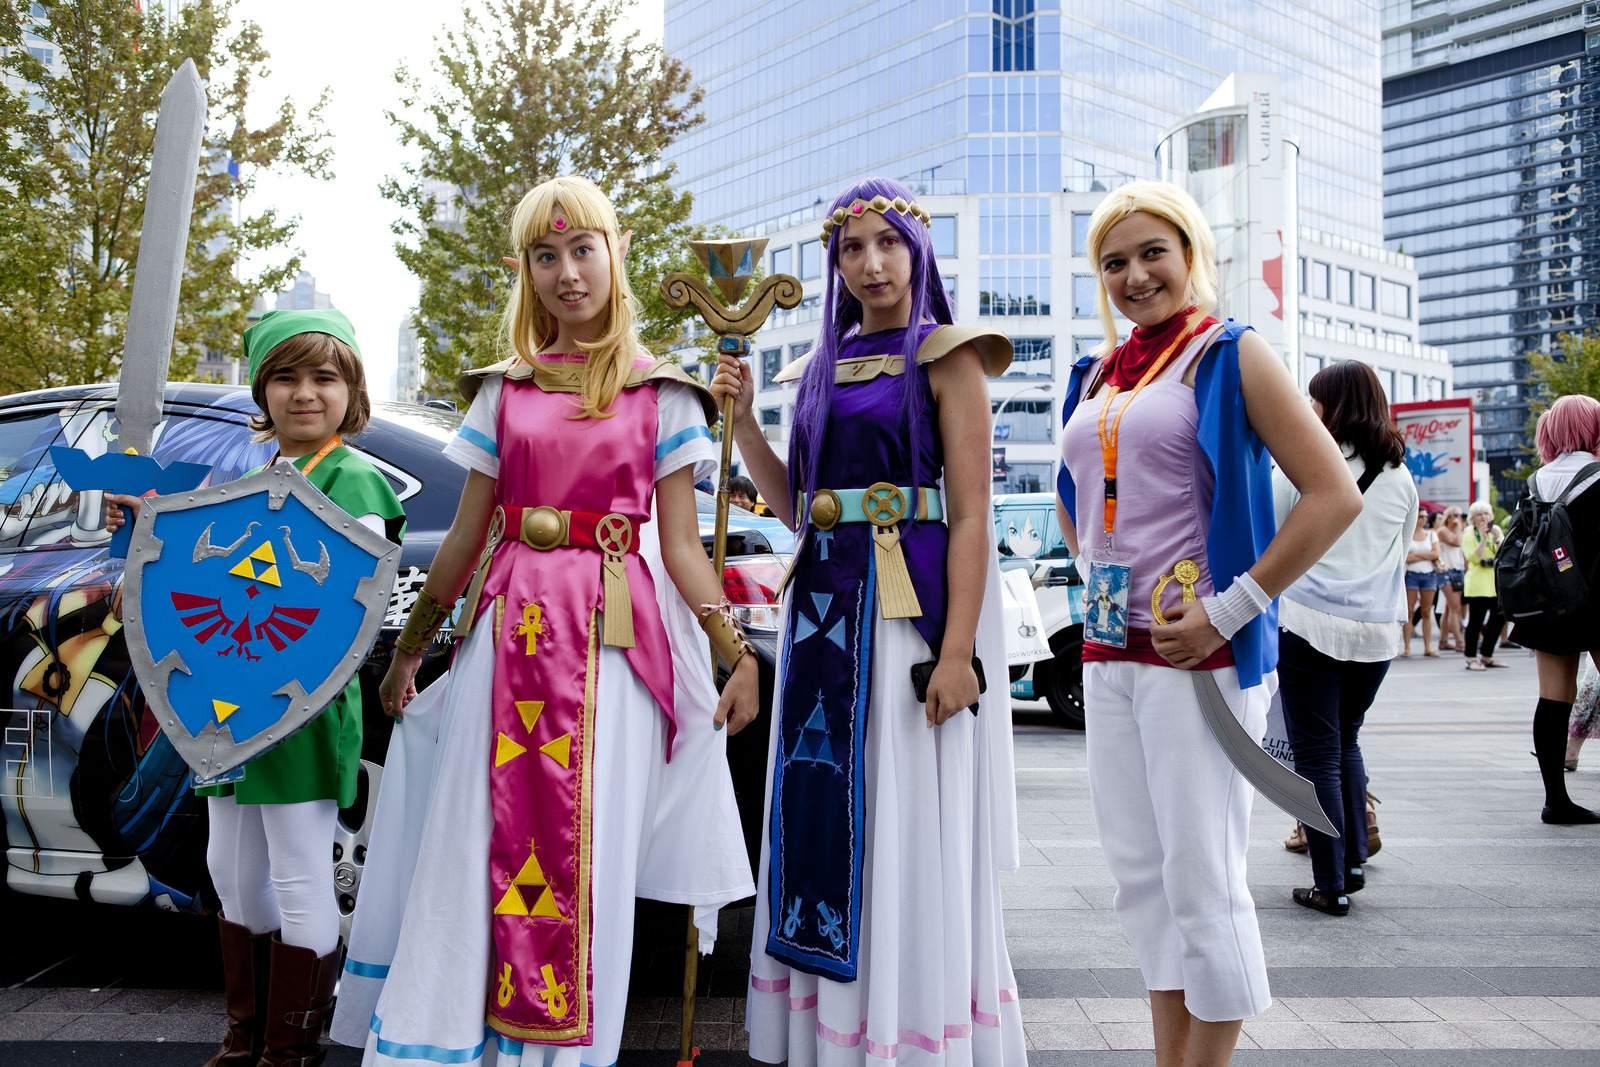 anime2 Anime Revolution 2014, Canada